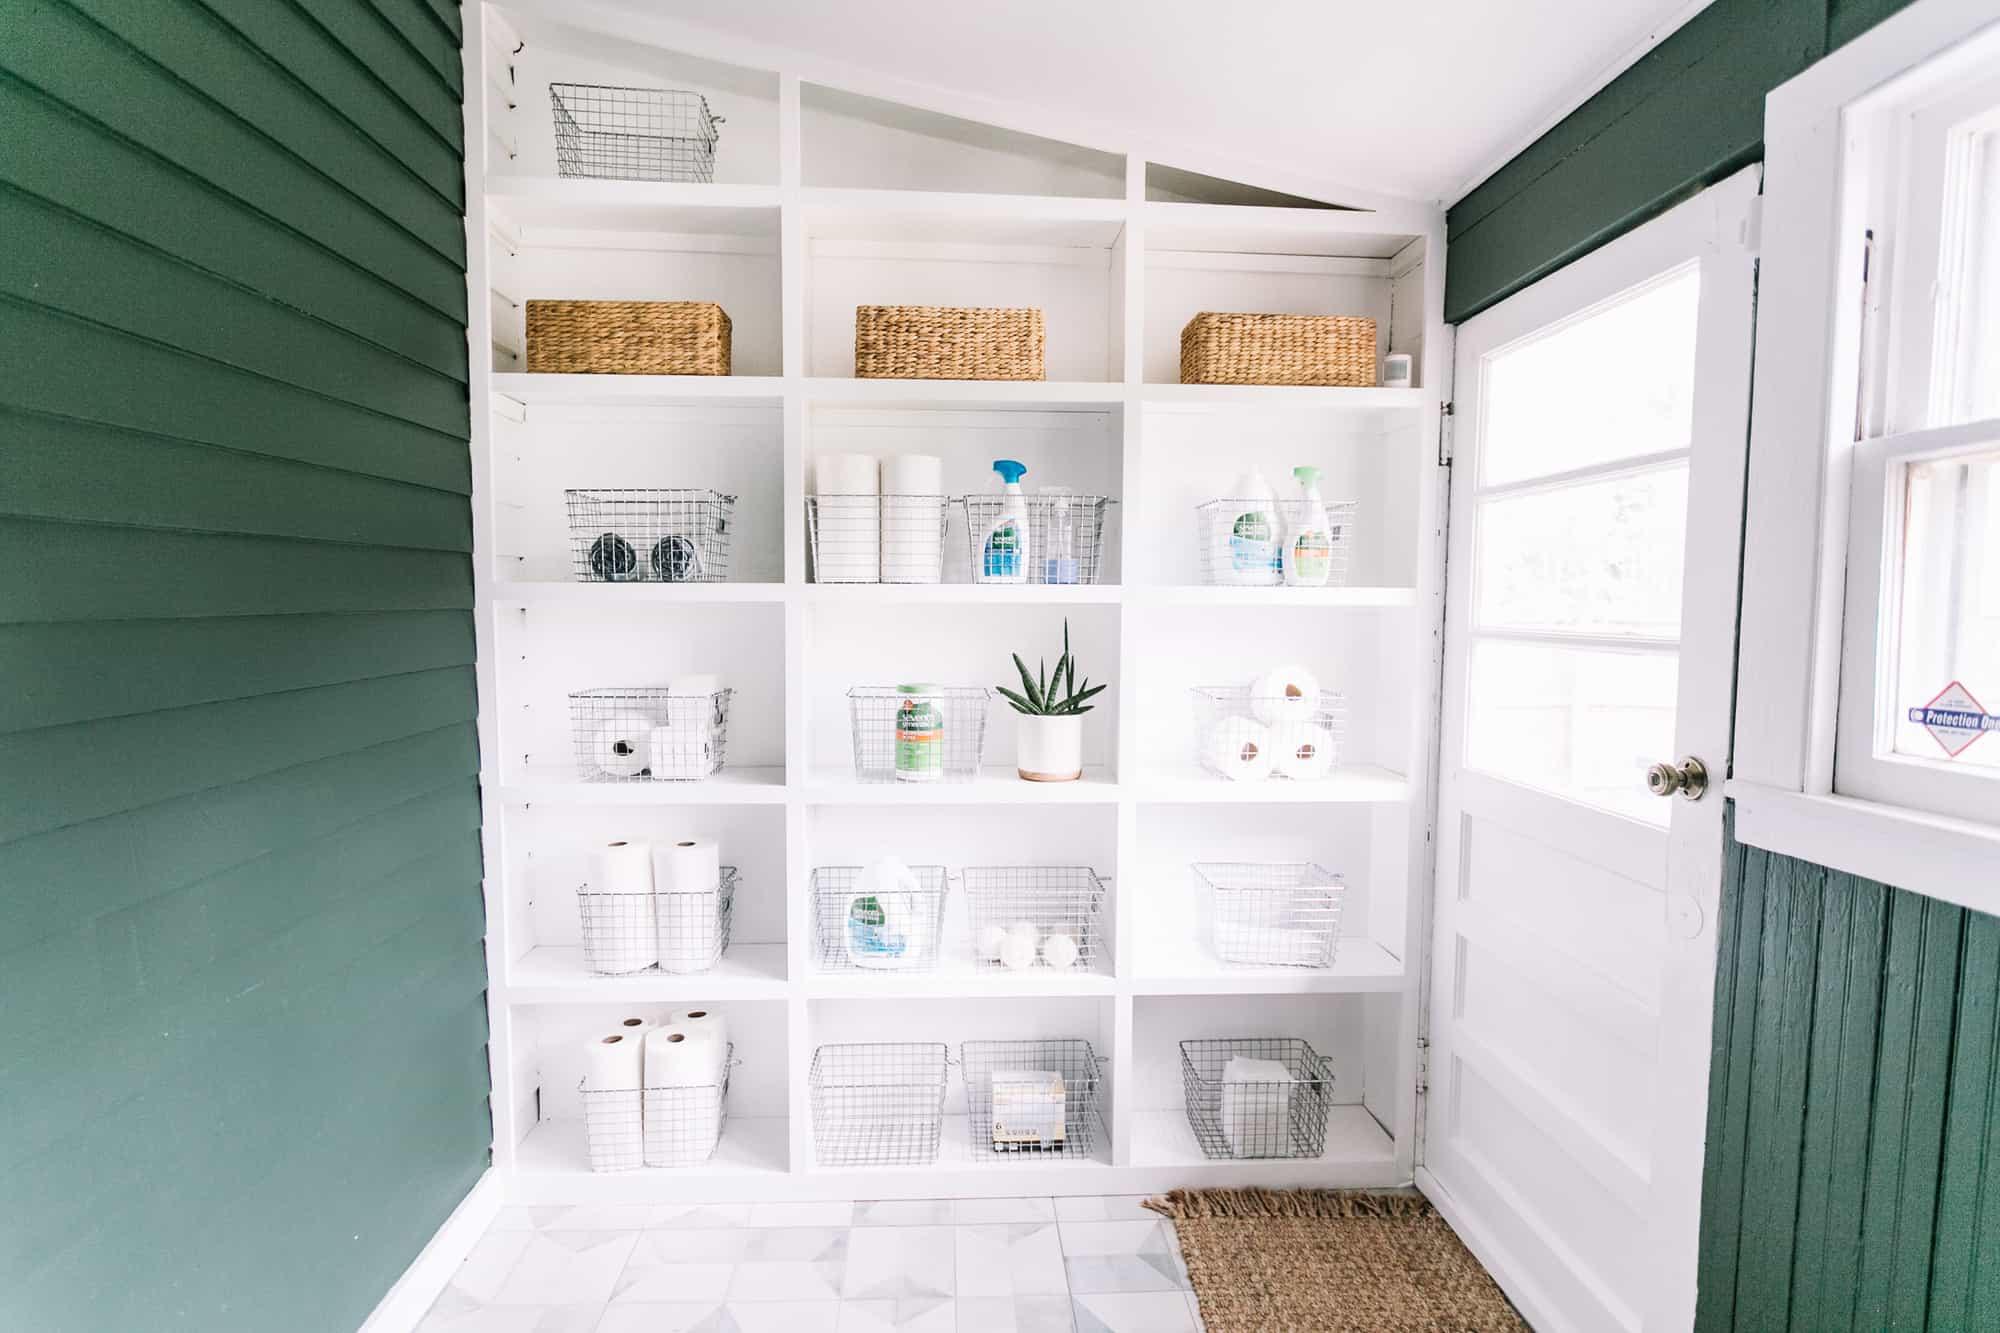 tip 2 focus on storage - Room Design Pic